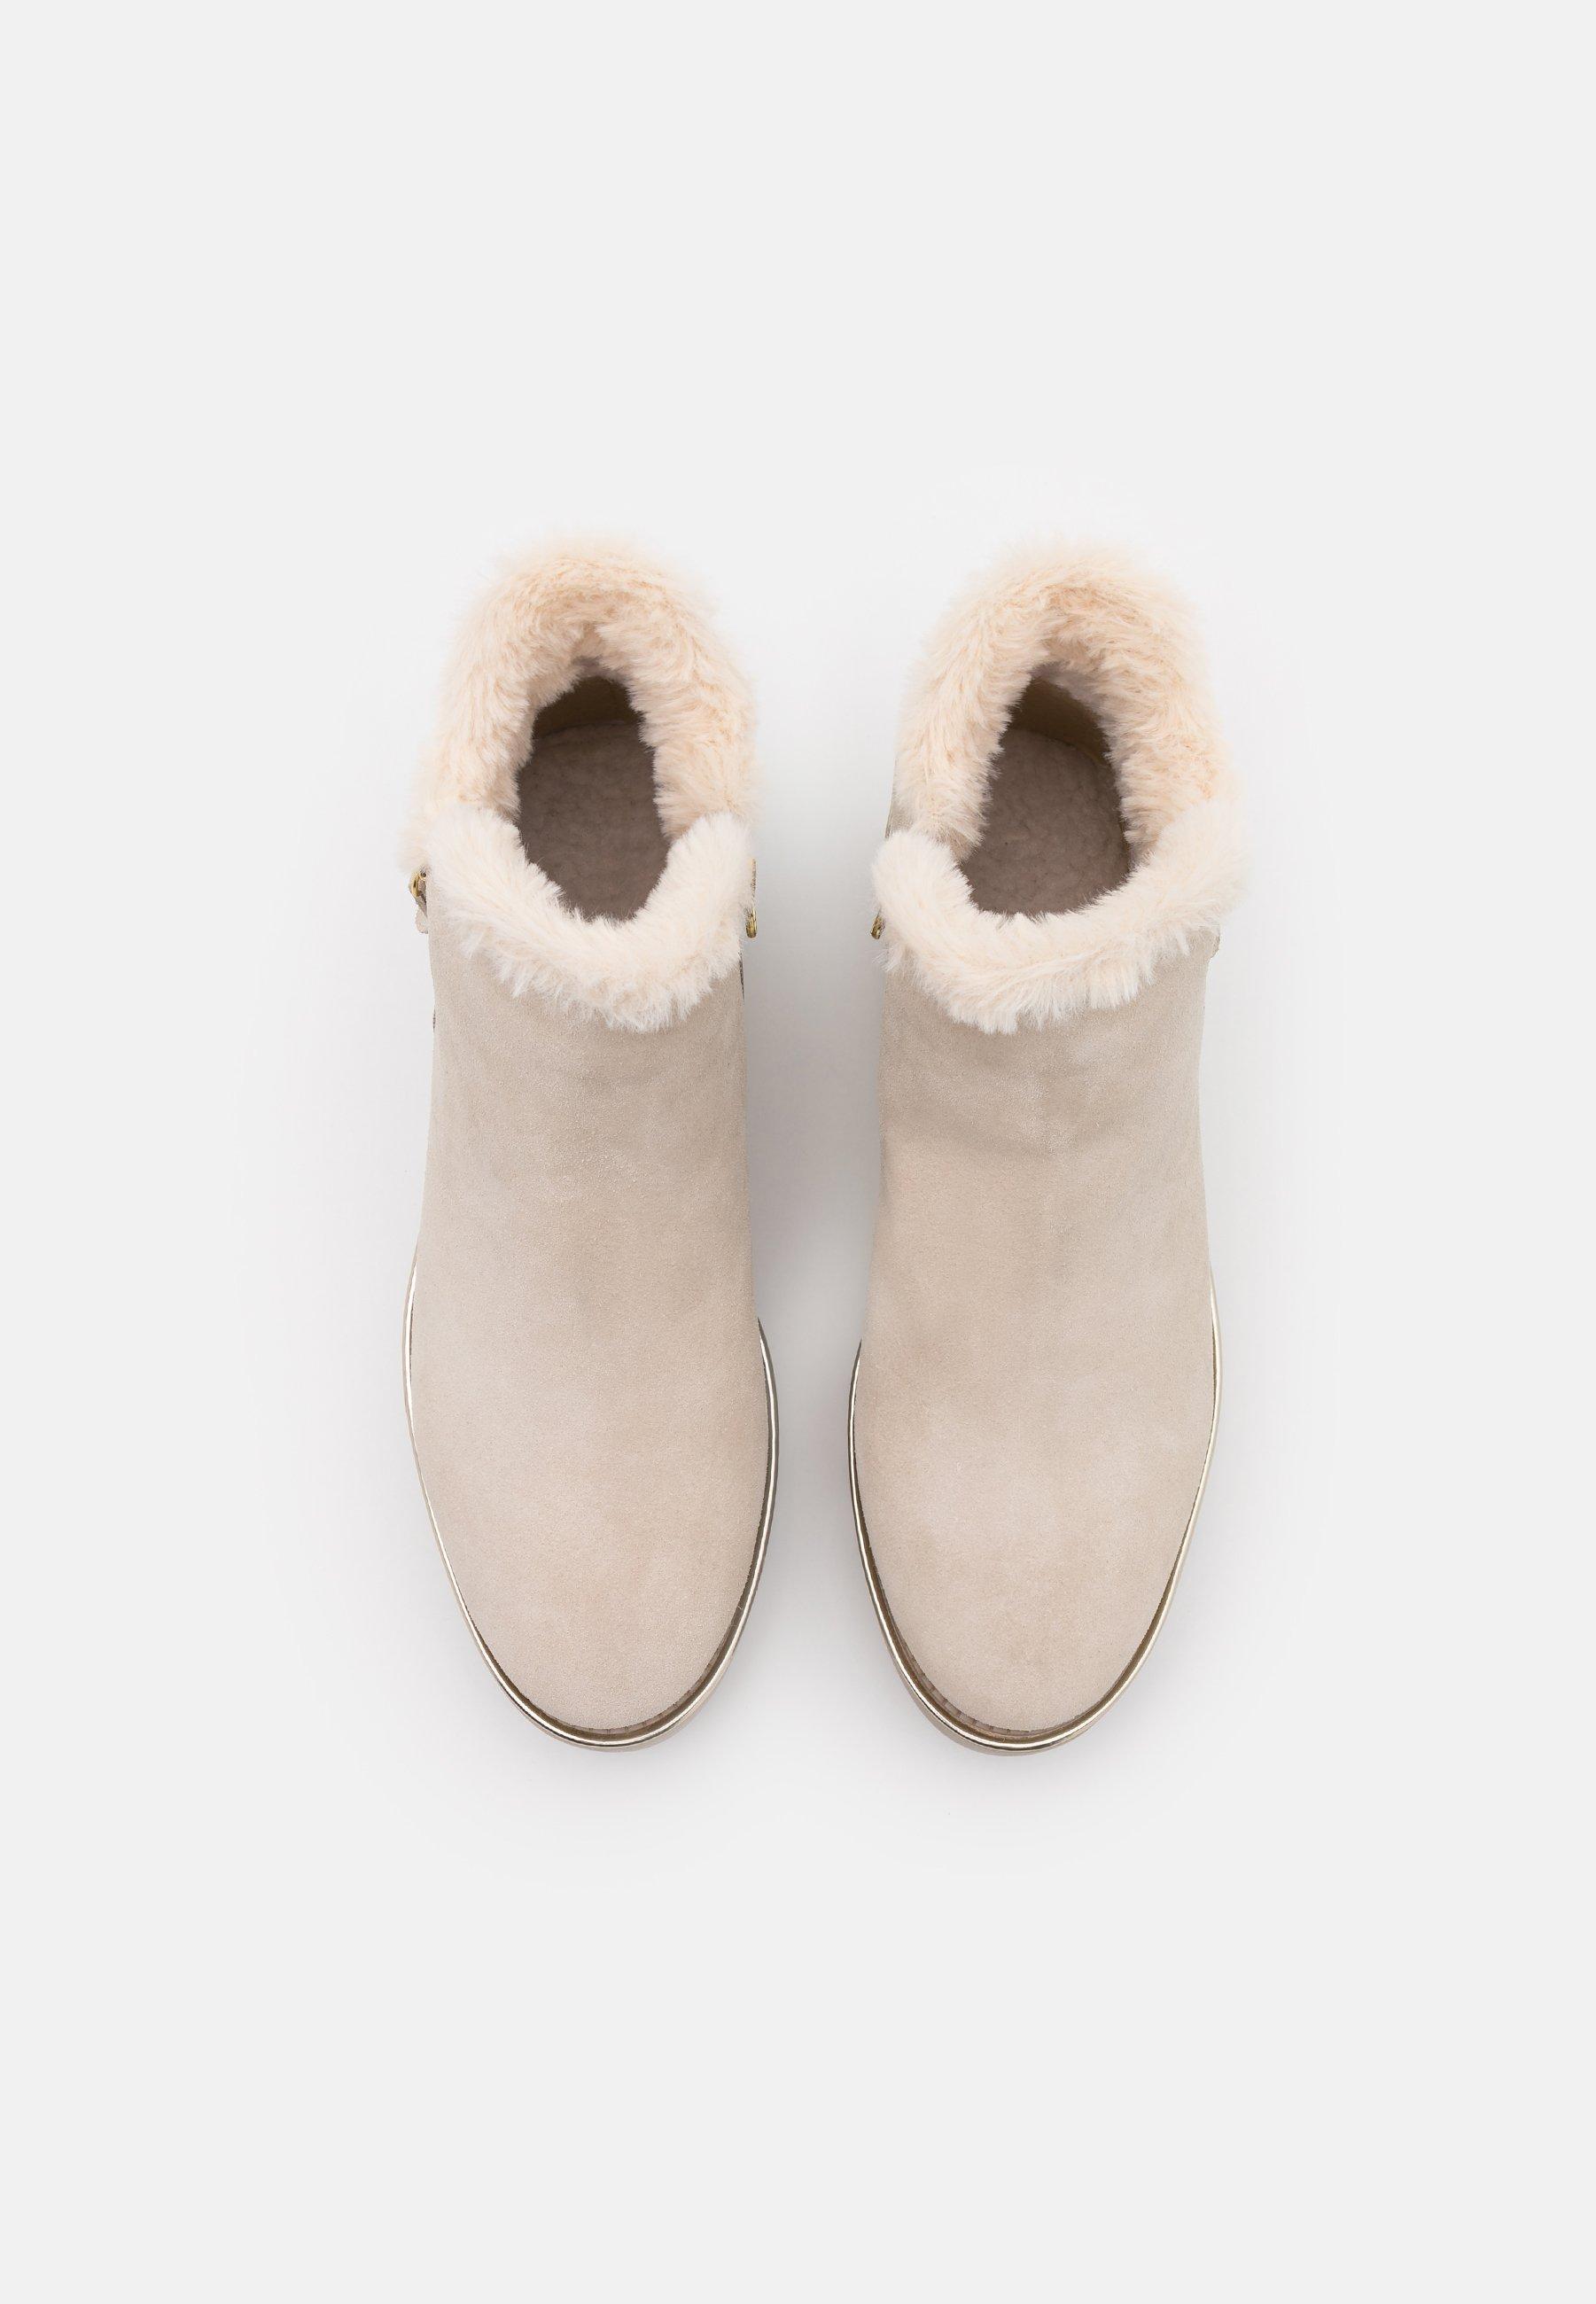 Tamaris Boots - Kilestøvletter Beige/beige